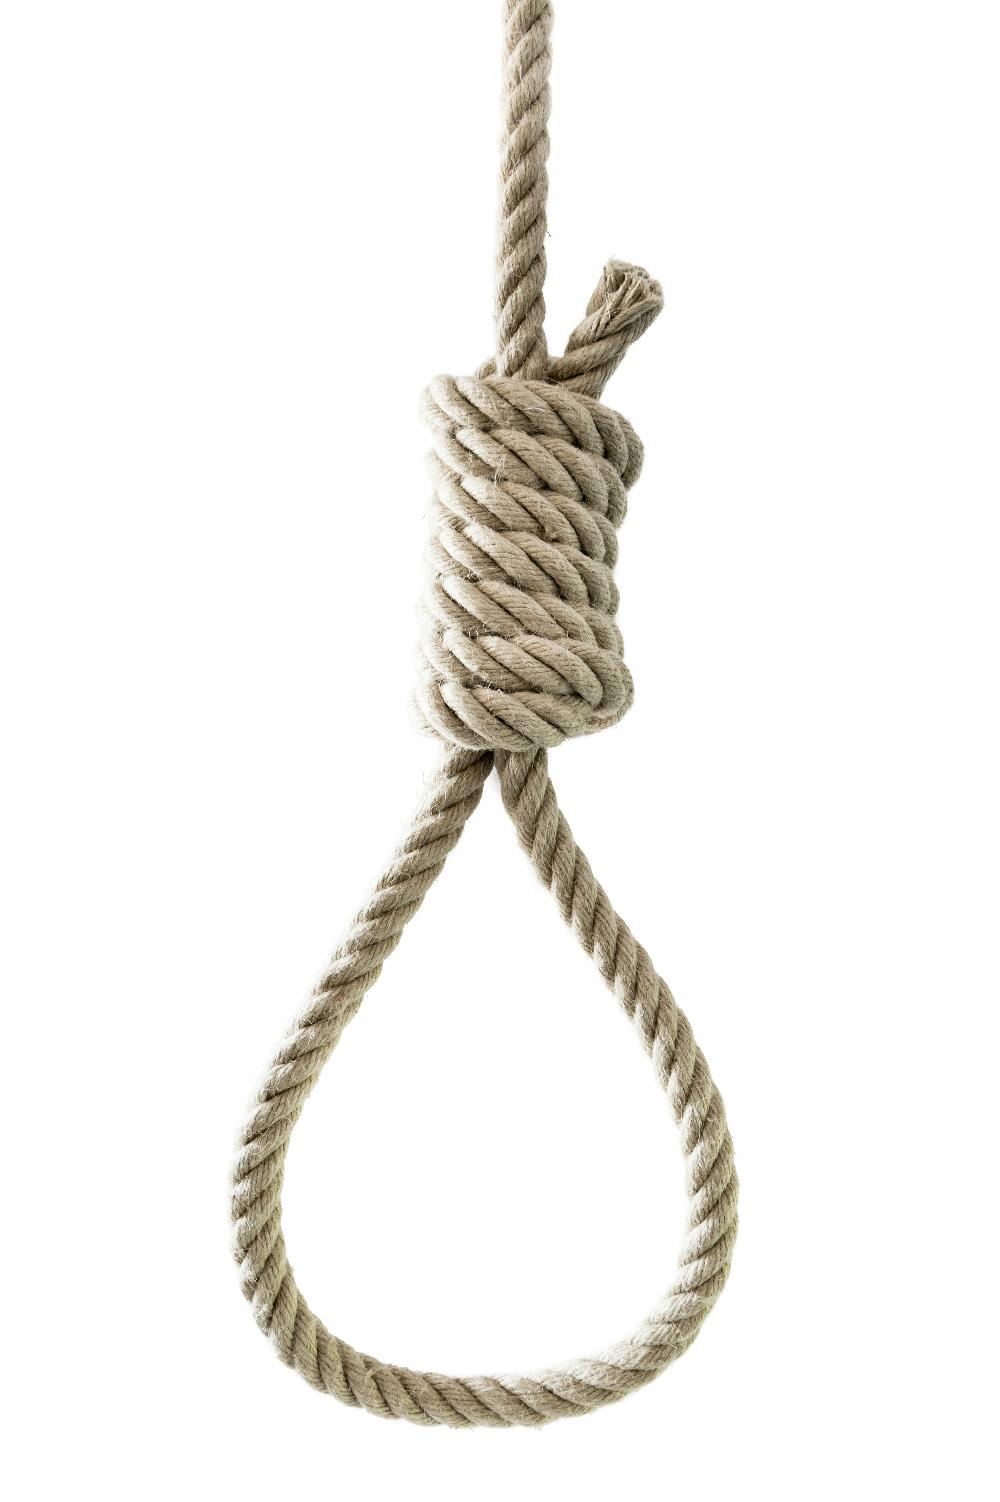 3d cgi noose hanging hentia cuties